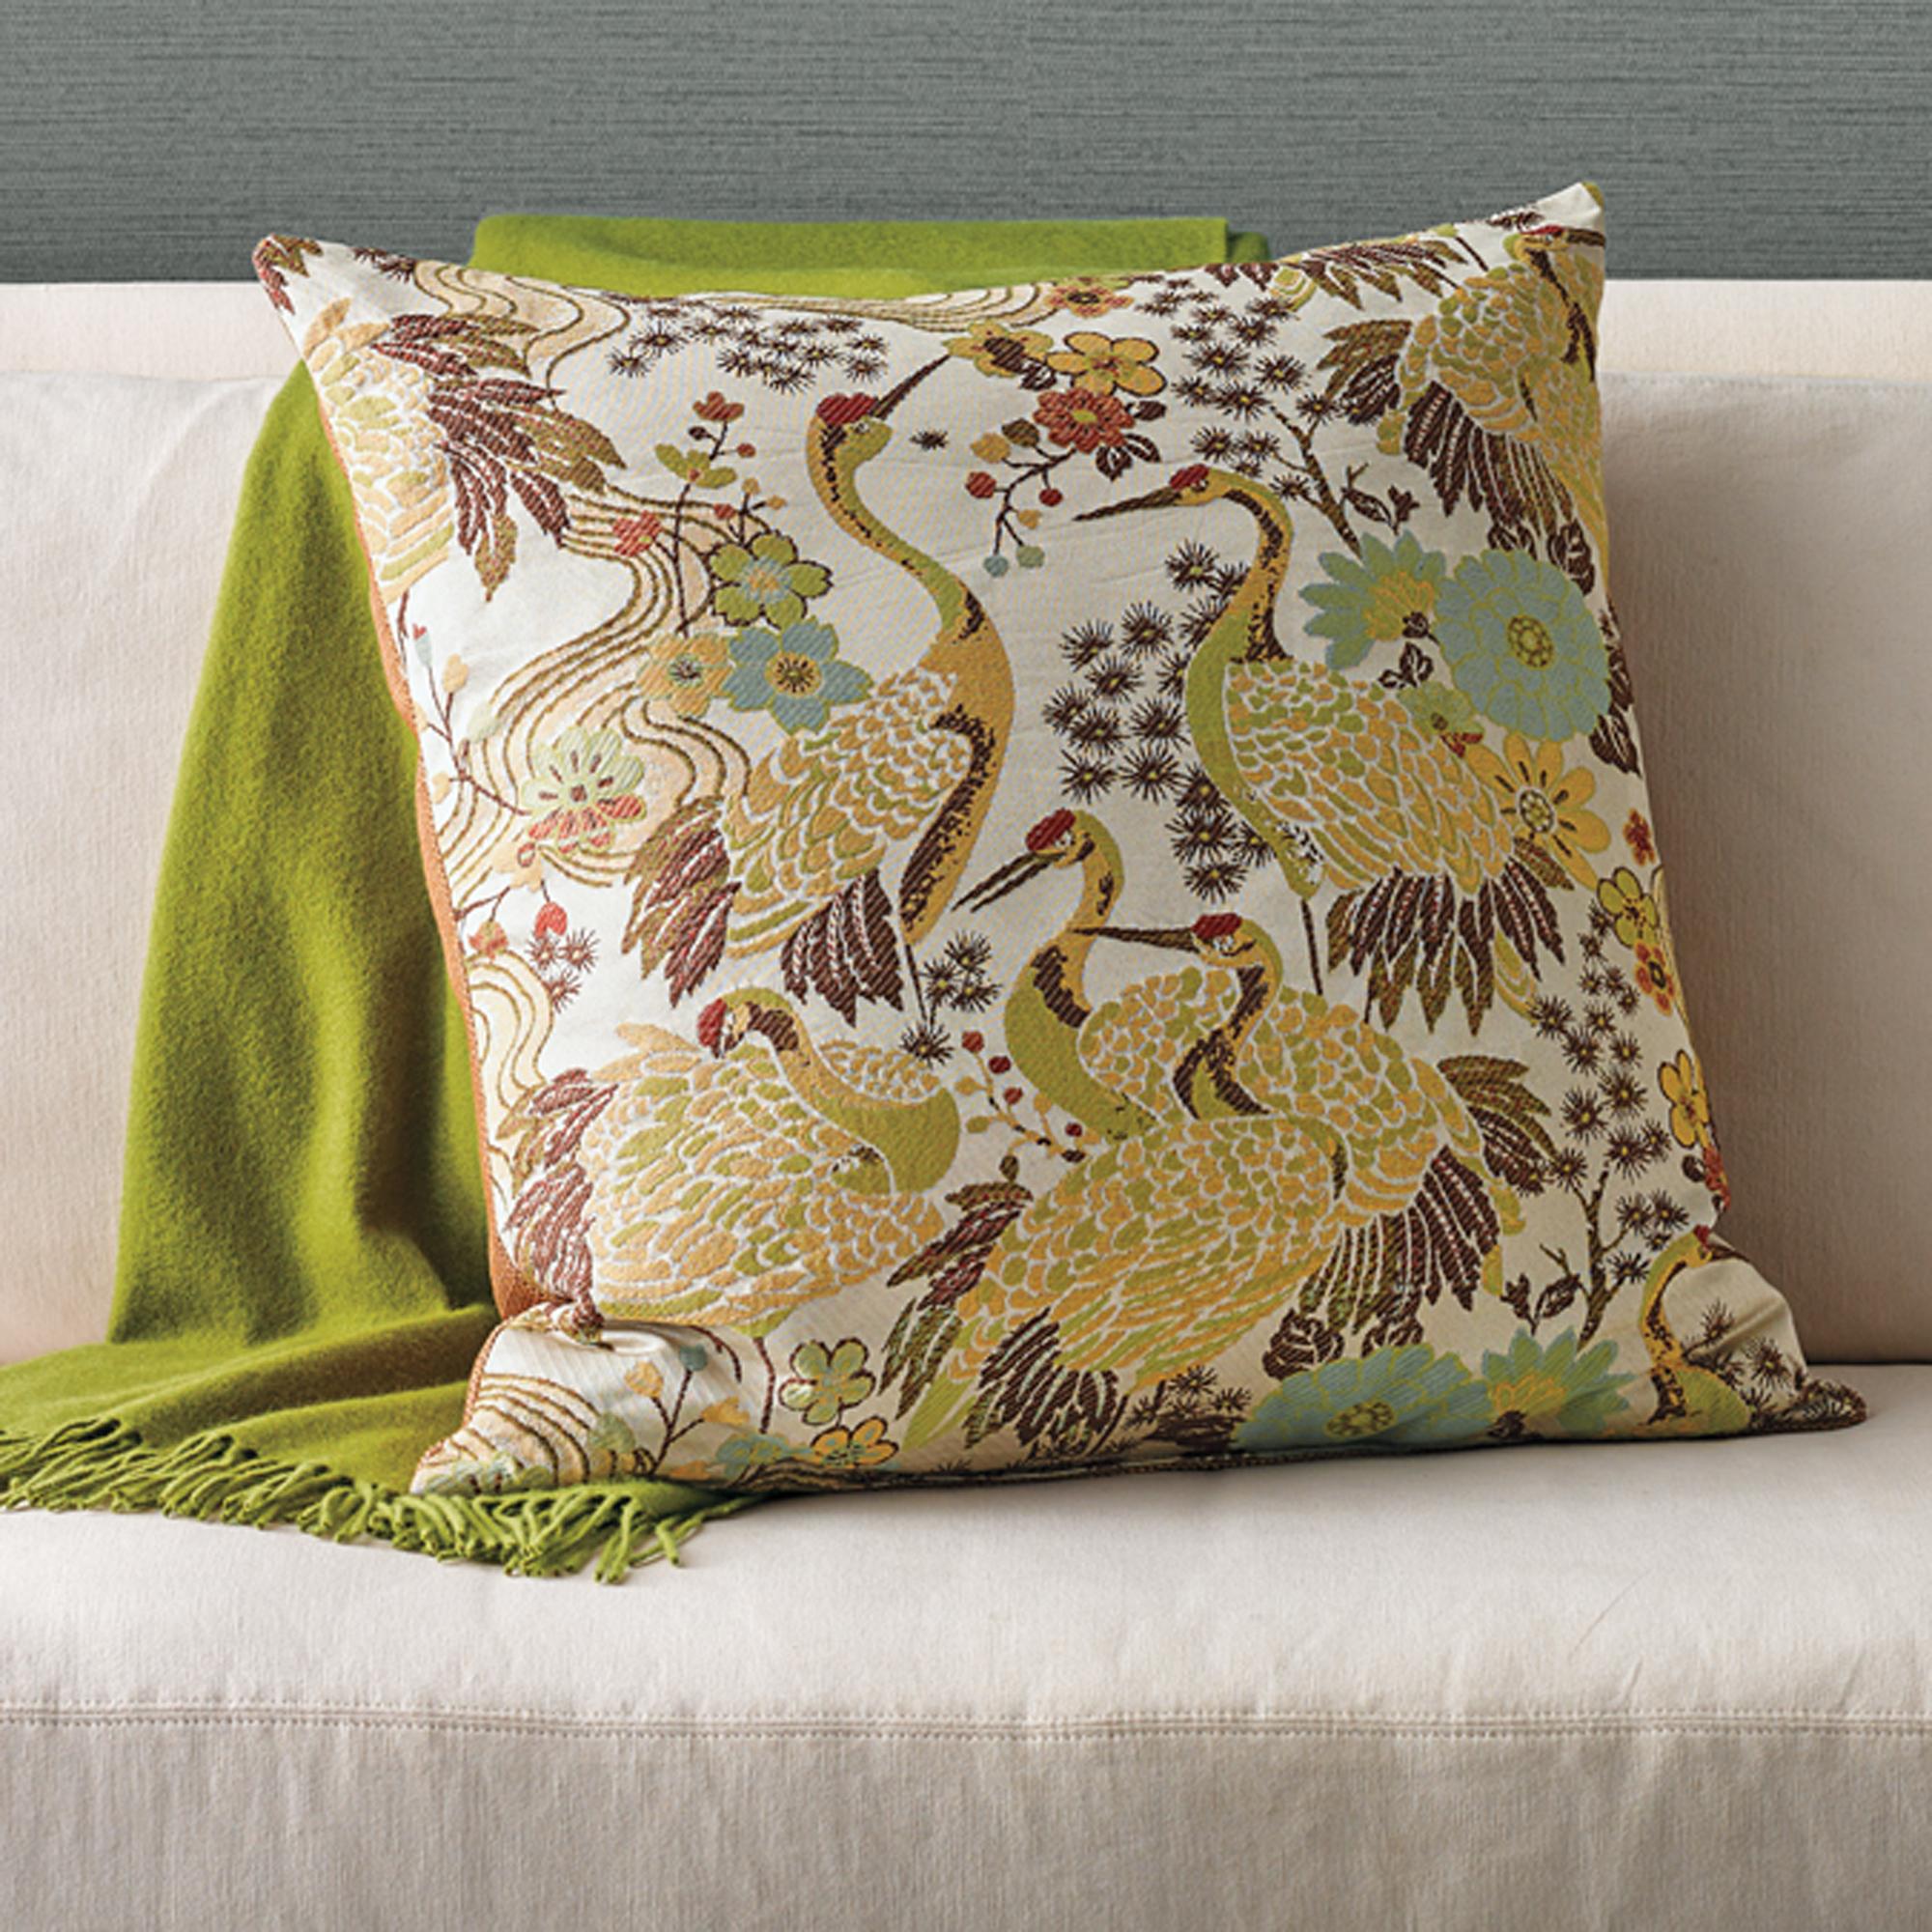 Throw Pillows Home : Crane Pillow Gump s